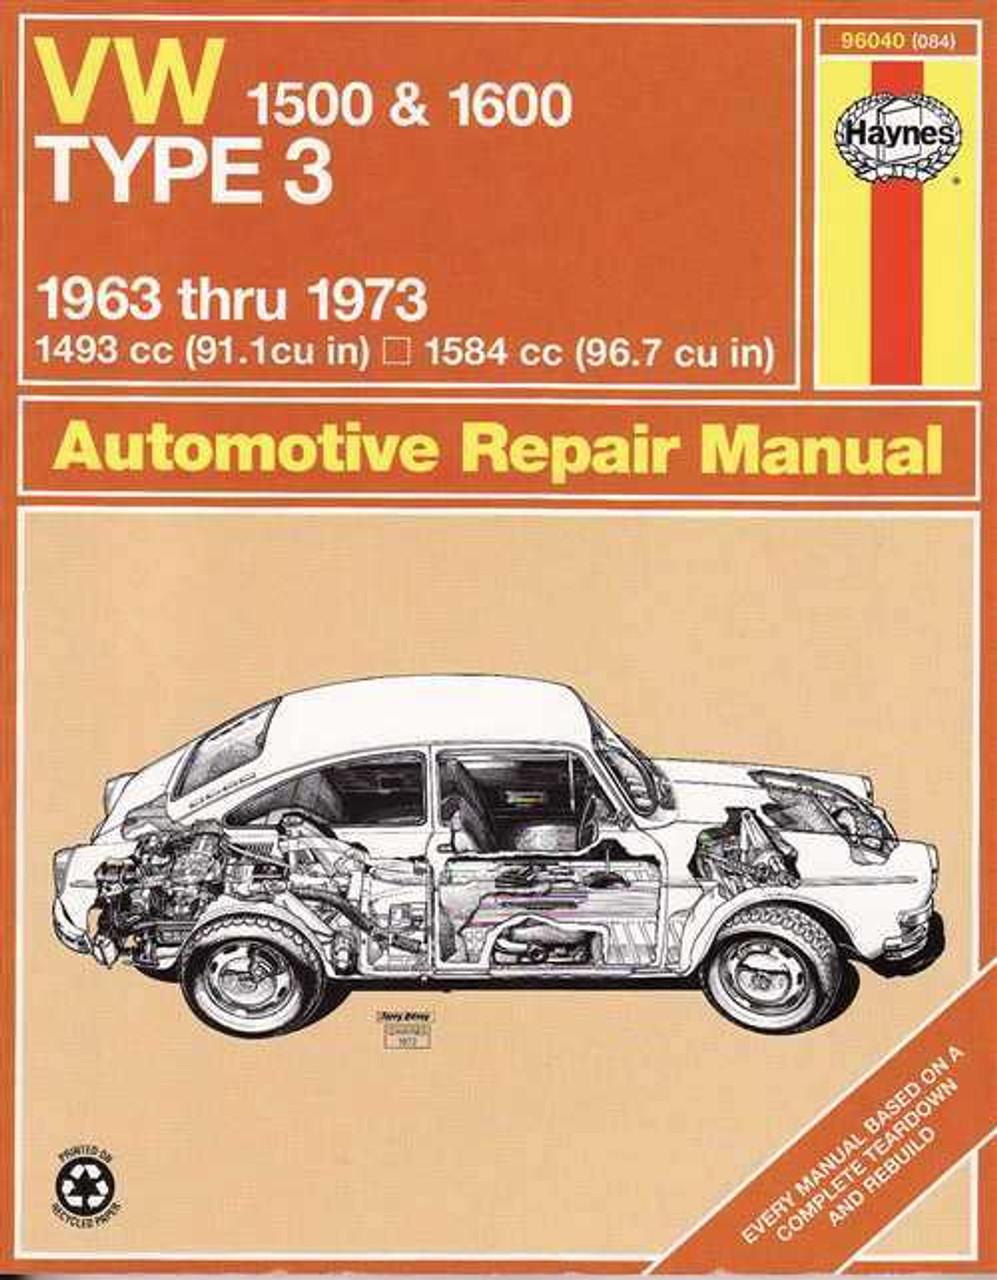 volkswagen 1500 amp 1600 type 3 1963 1973 workshop manual rh automotobookshop com au Bentley Service Manual VW VW Mechanic